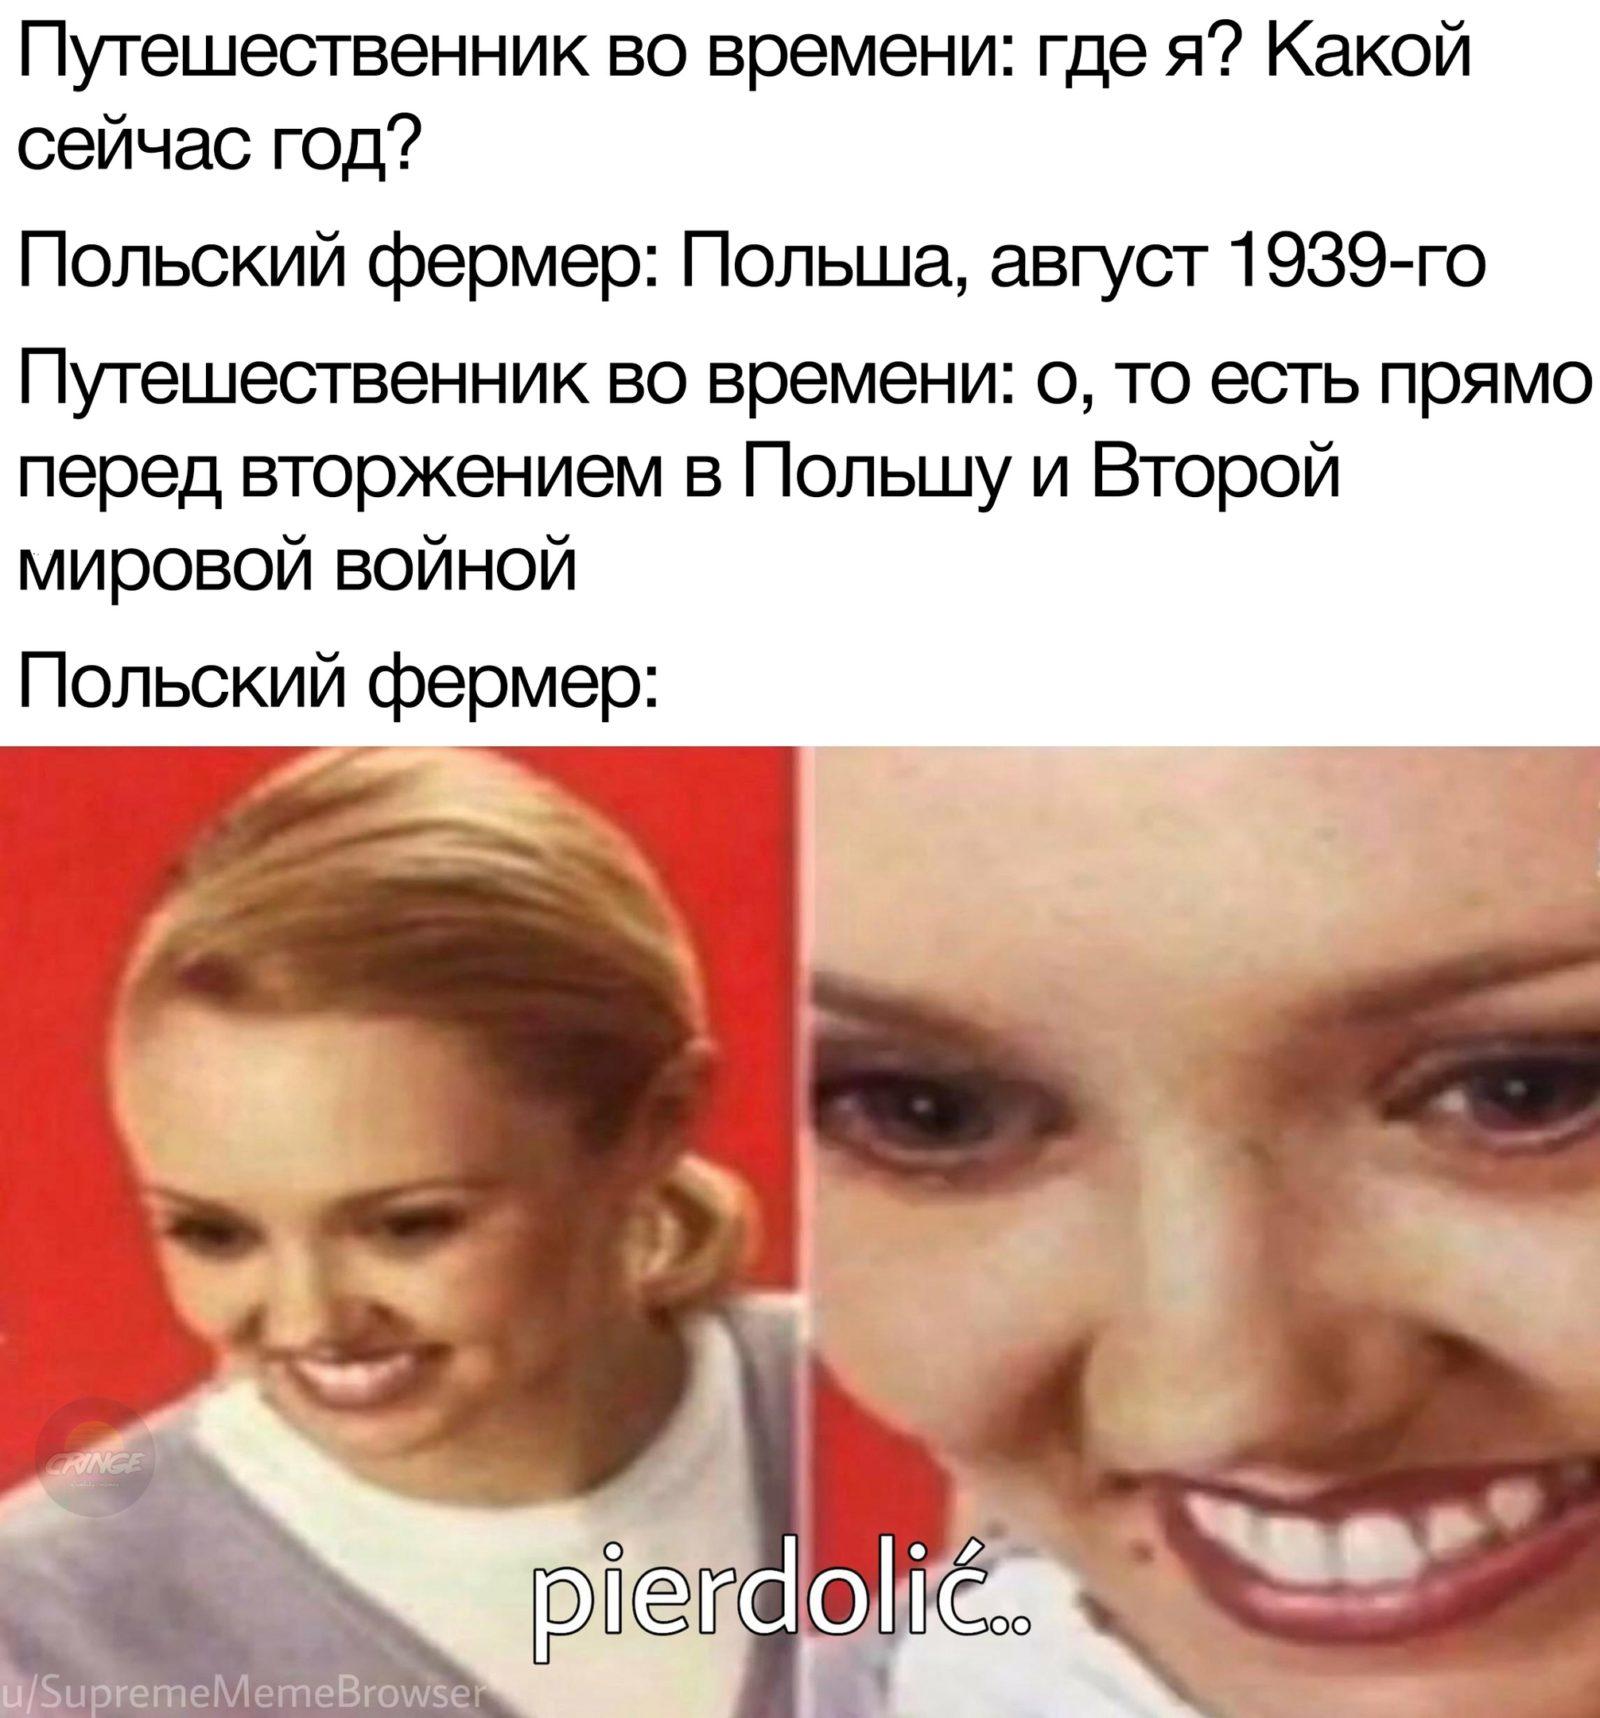 Мем про путешественника во времени